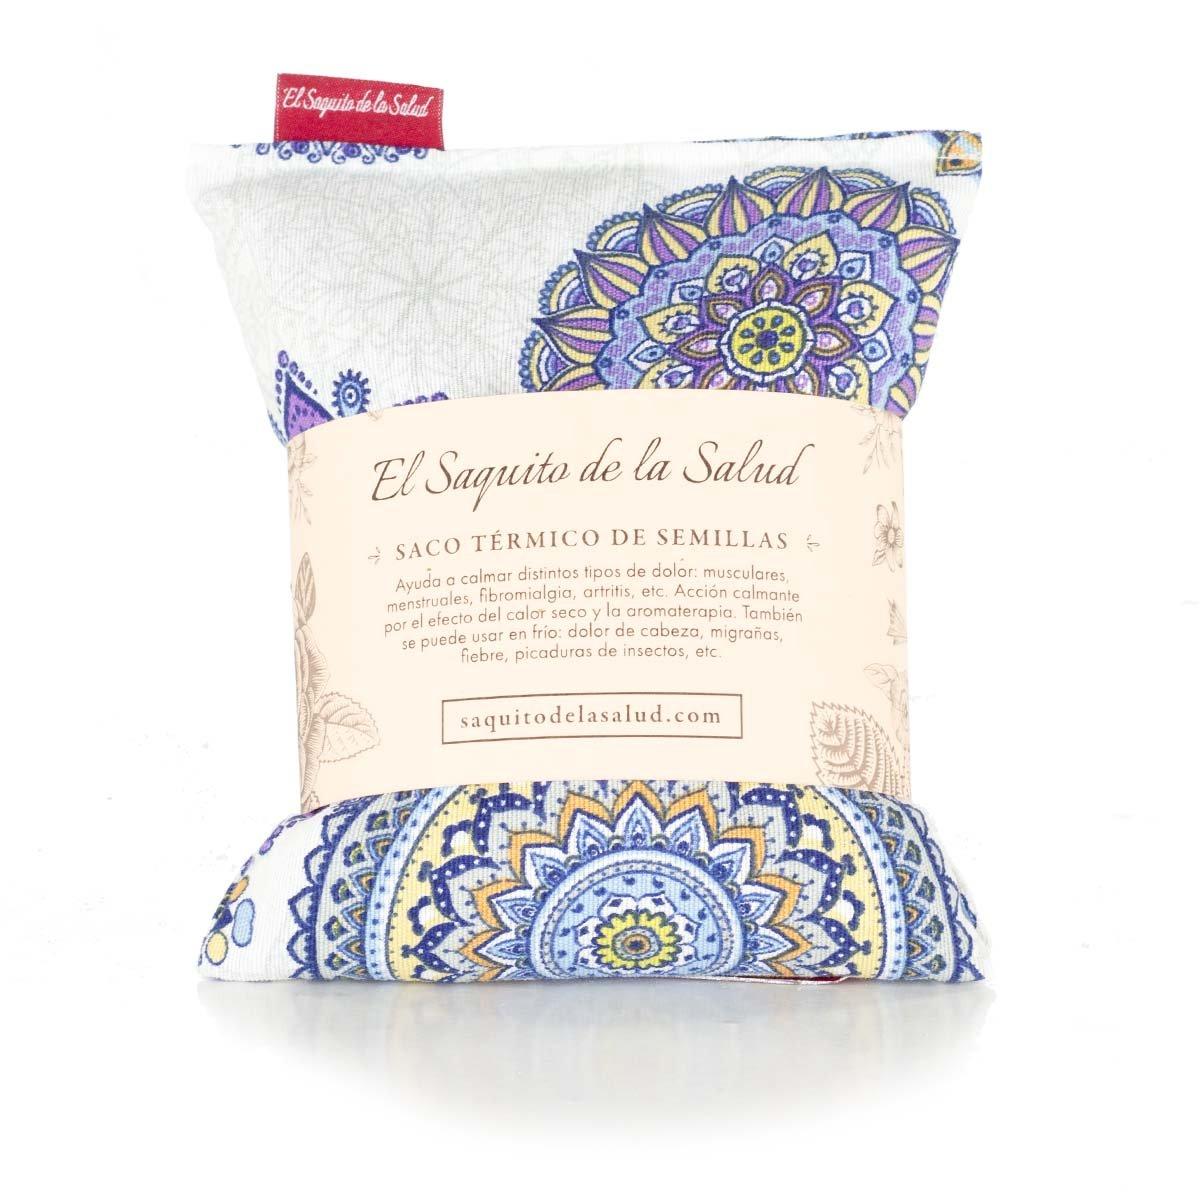 Saco Térmico de Semillas aroma Lavanda, Azahar o Romero tejido Estrellas Azules (Azahar, 23 cm): Amazon.es: Hogar